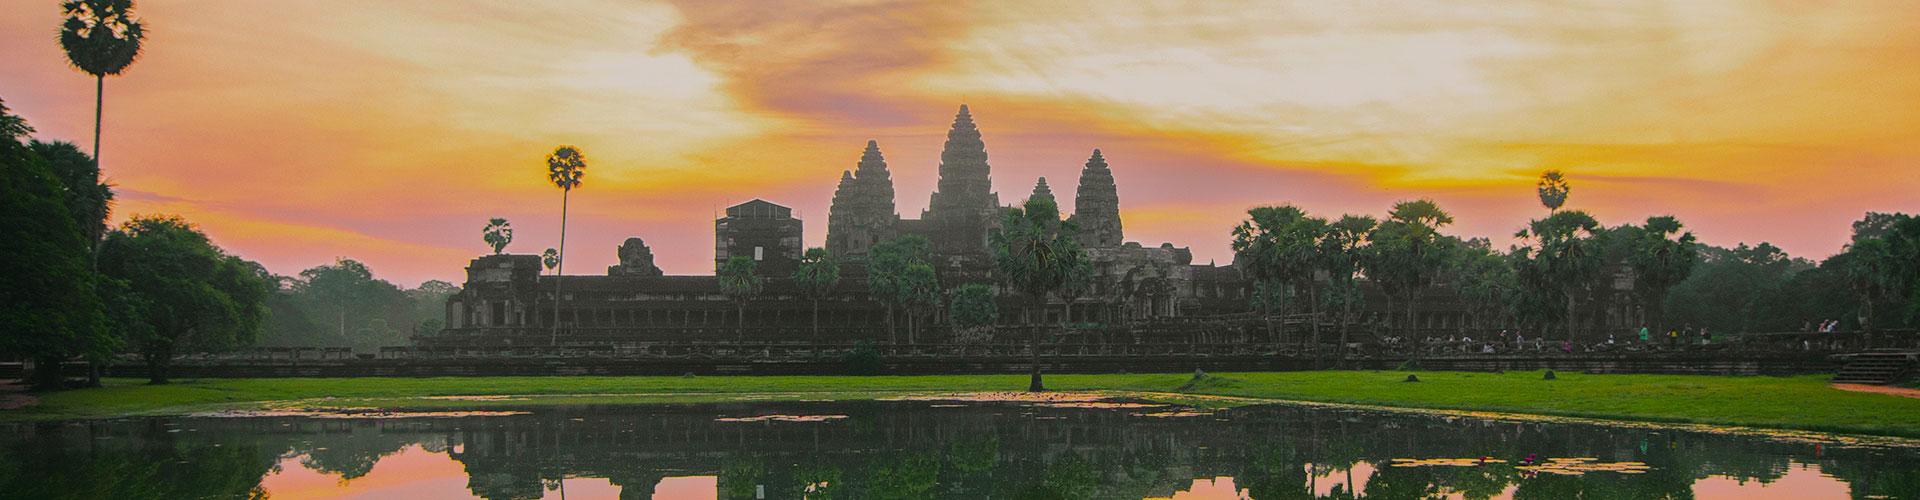 Landmark photograph of Cambodia